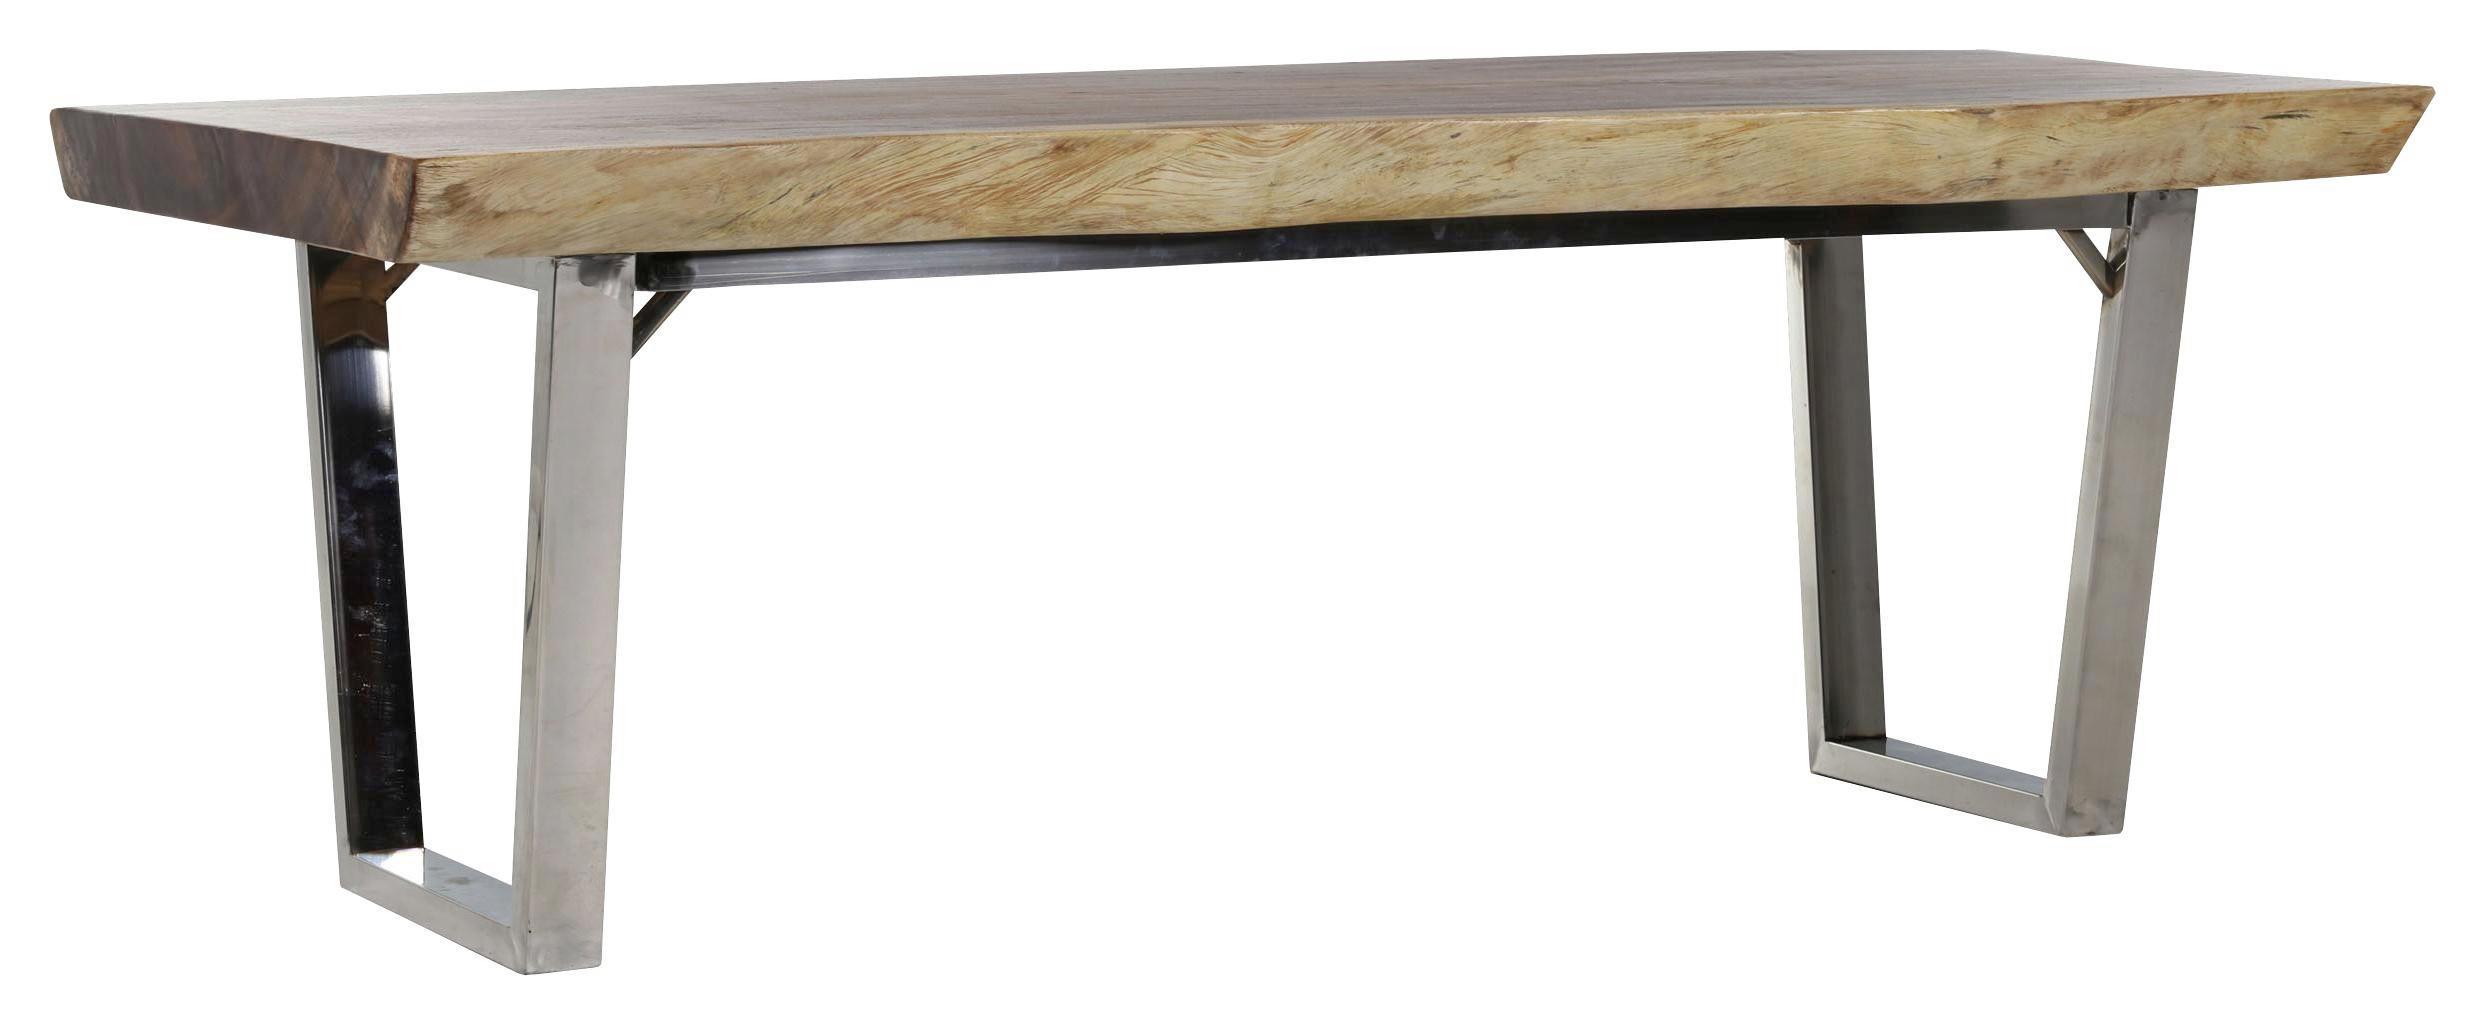 ESSTISCH Suar Holz Massiv Rechteckig Naturfarben    Edelstahlfarben/Naturfarben, Design, Holz/Metall